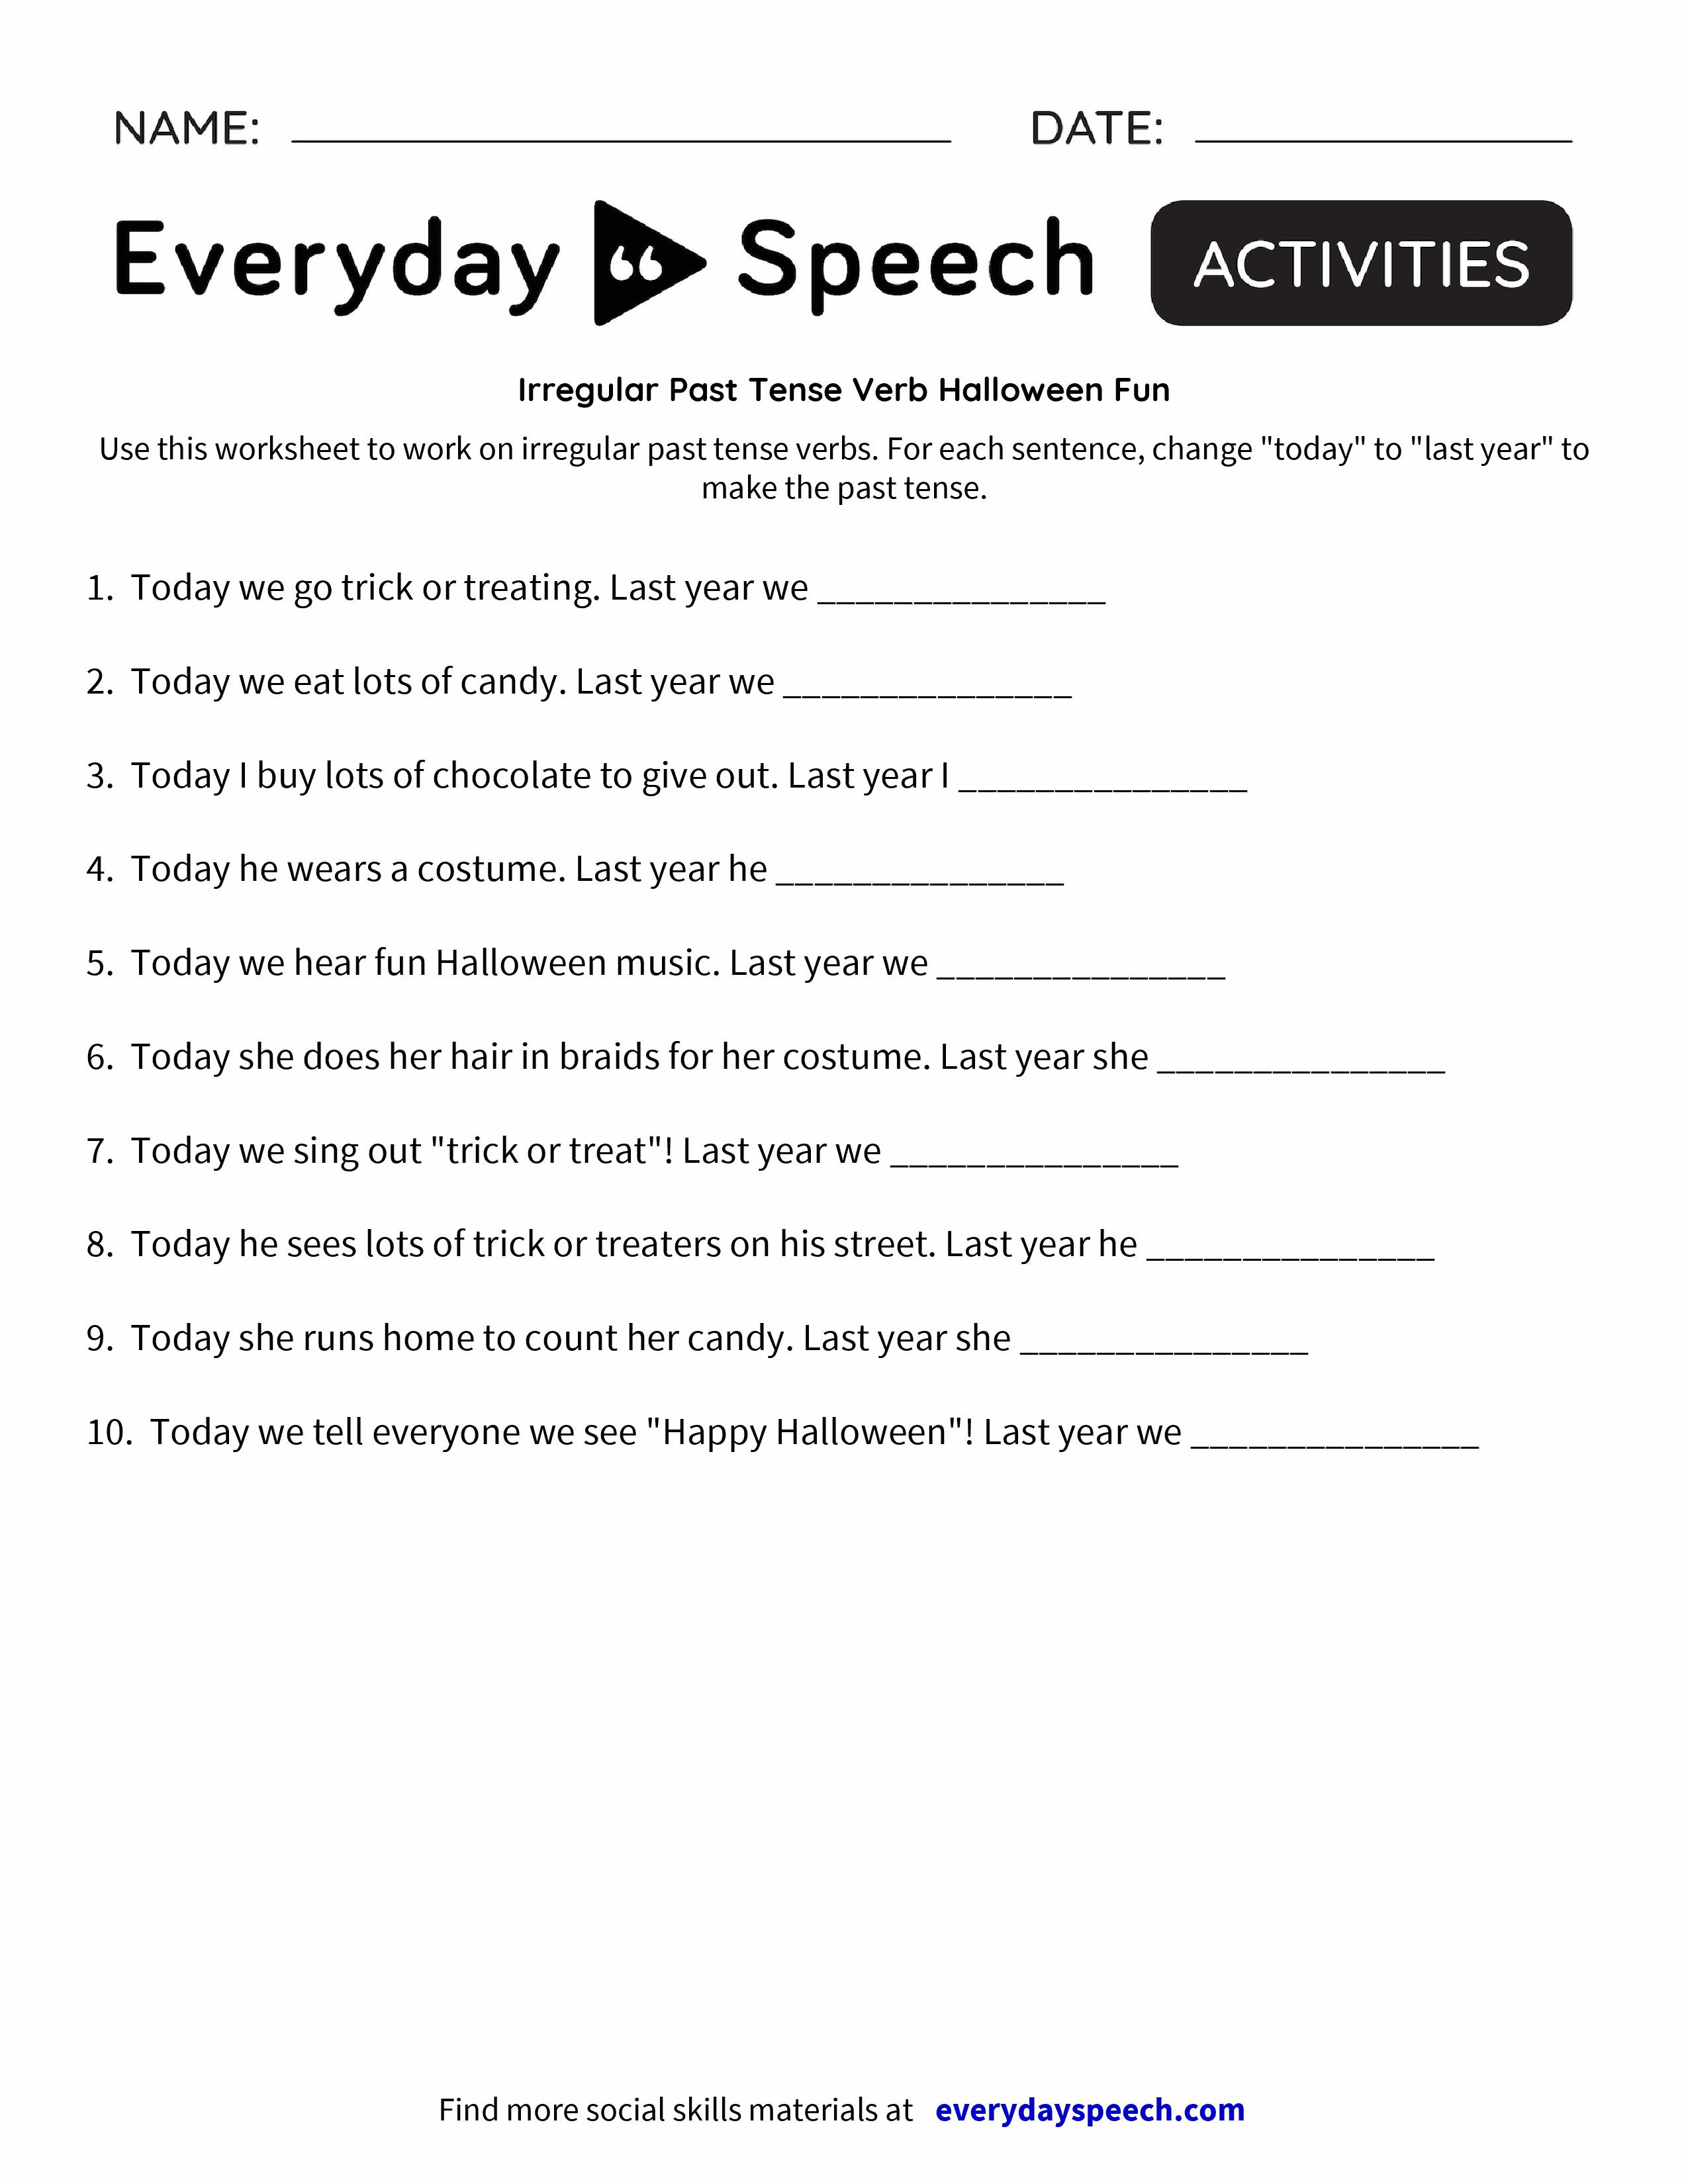 English worksheets: Past Tense Verbs Review